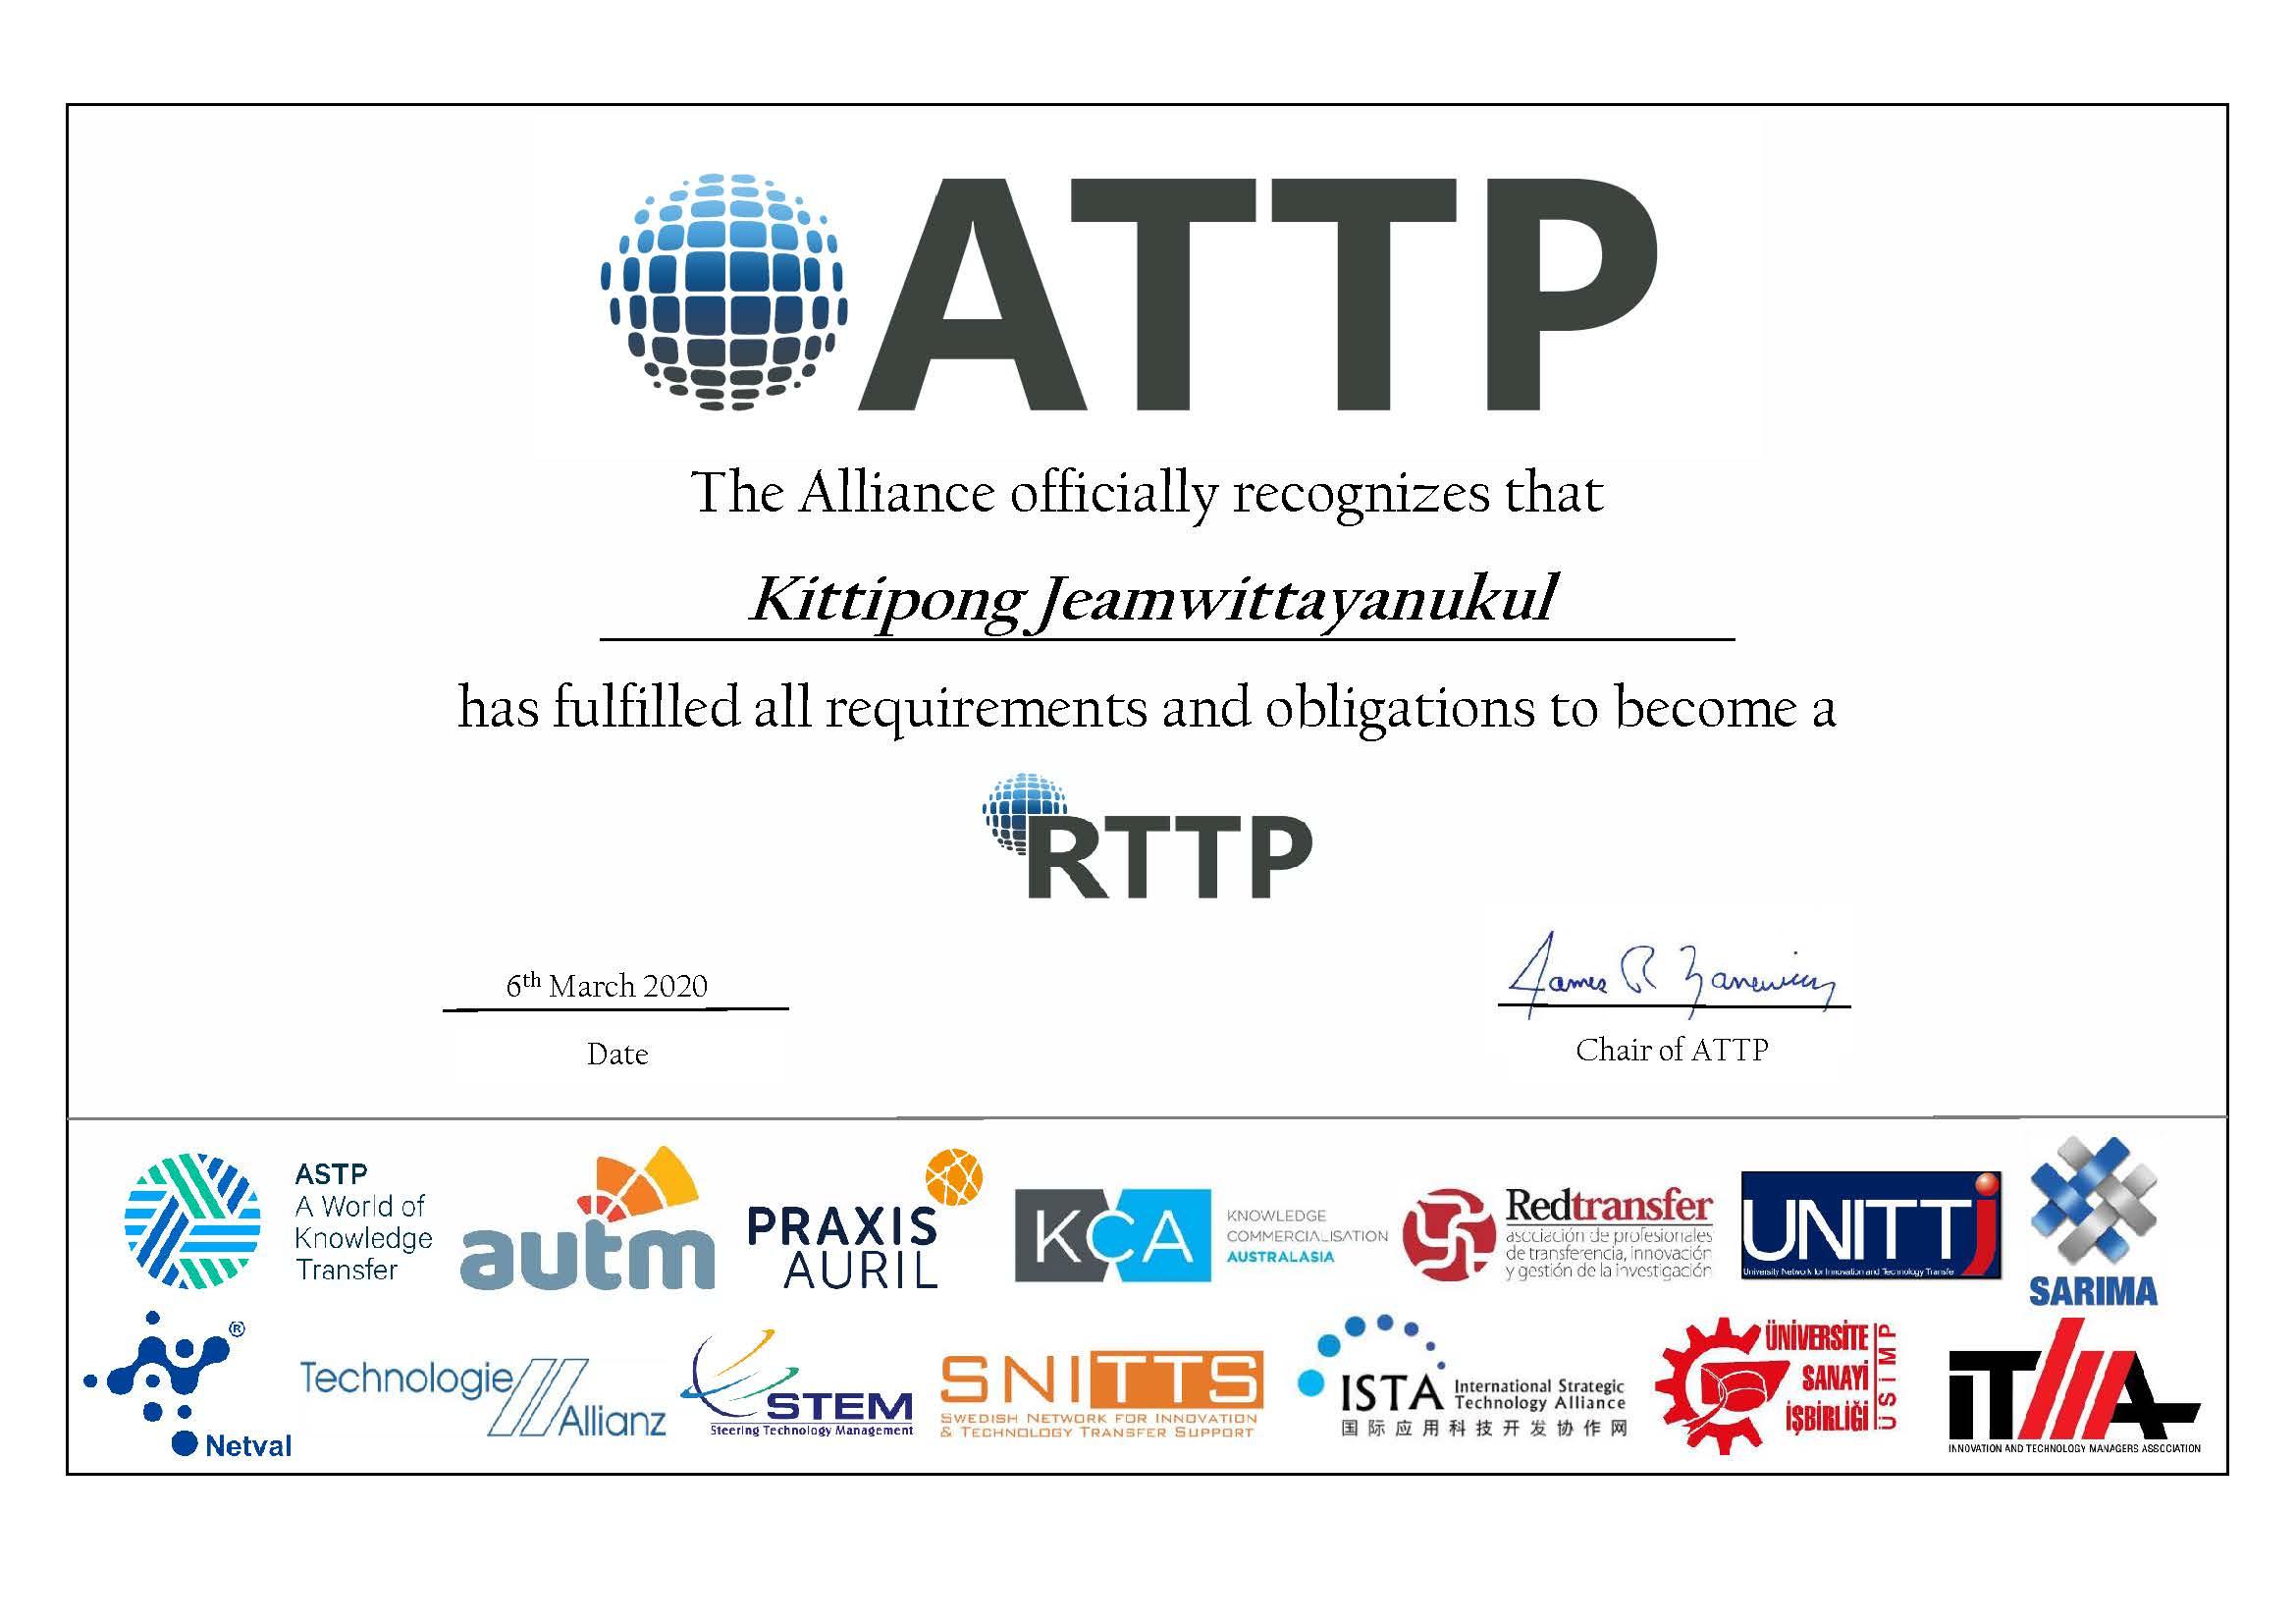 2_2_Kittipong-Jeamwittayanukul-ATTP-RTTP-Certificate.jpg